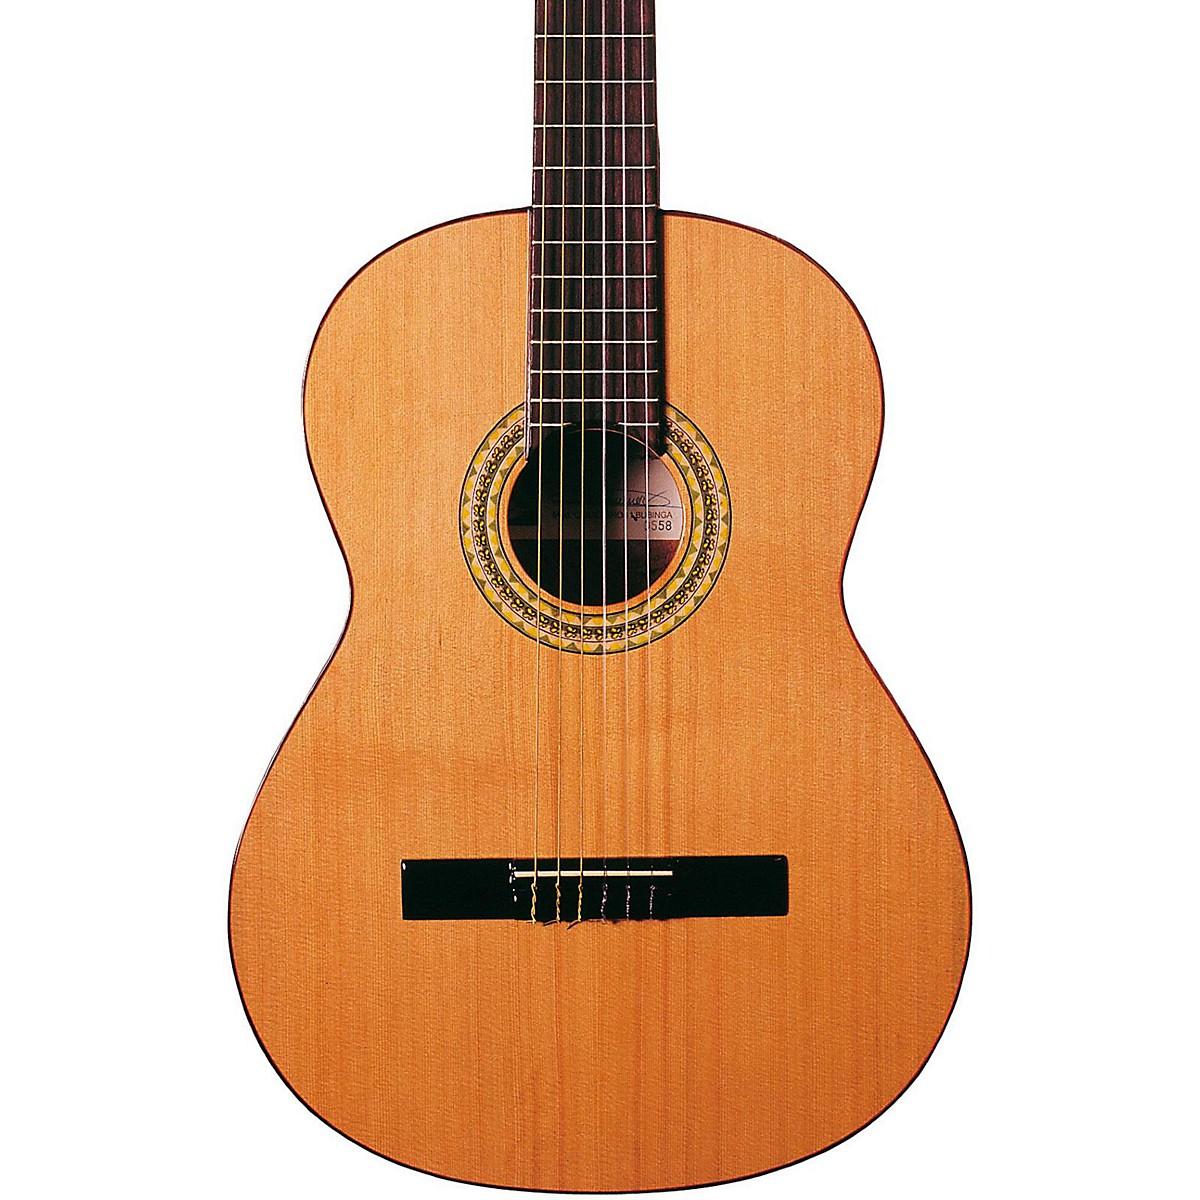 Jasmine Caballero 11 Cedar Top Classical Guitar